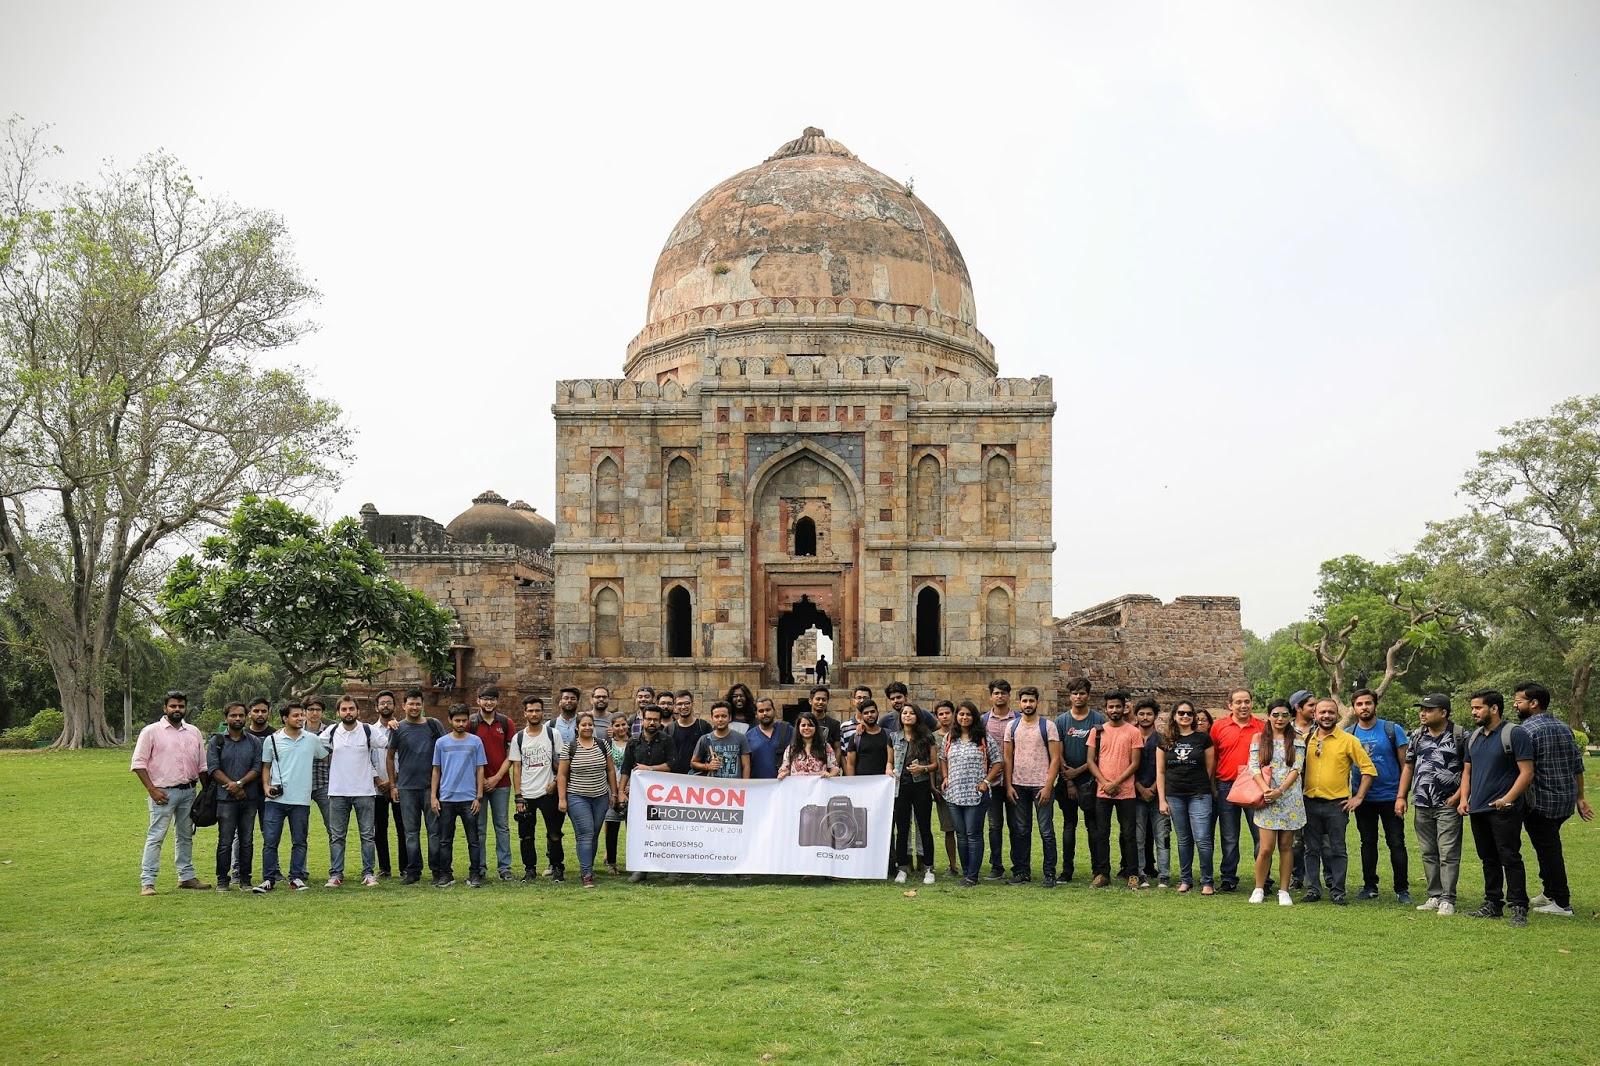 Canon India Marks 'World Photography Day' Celebrations, Promoting